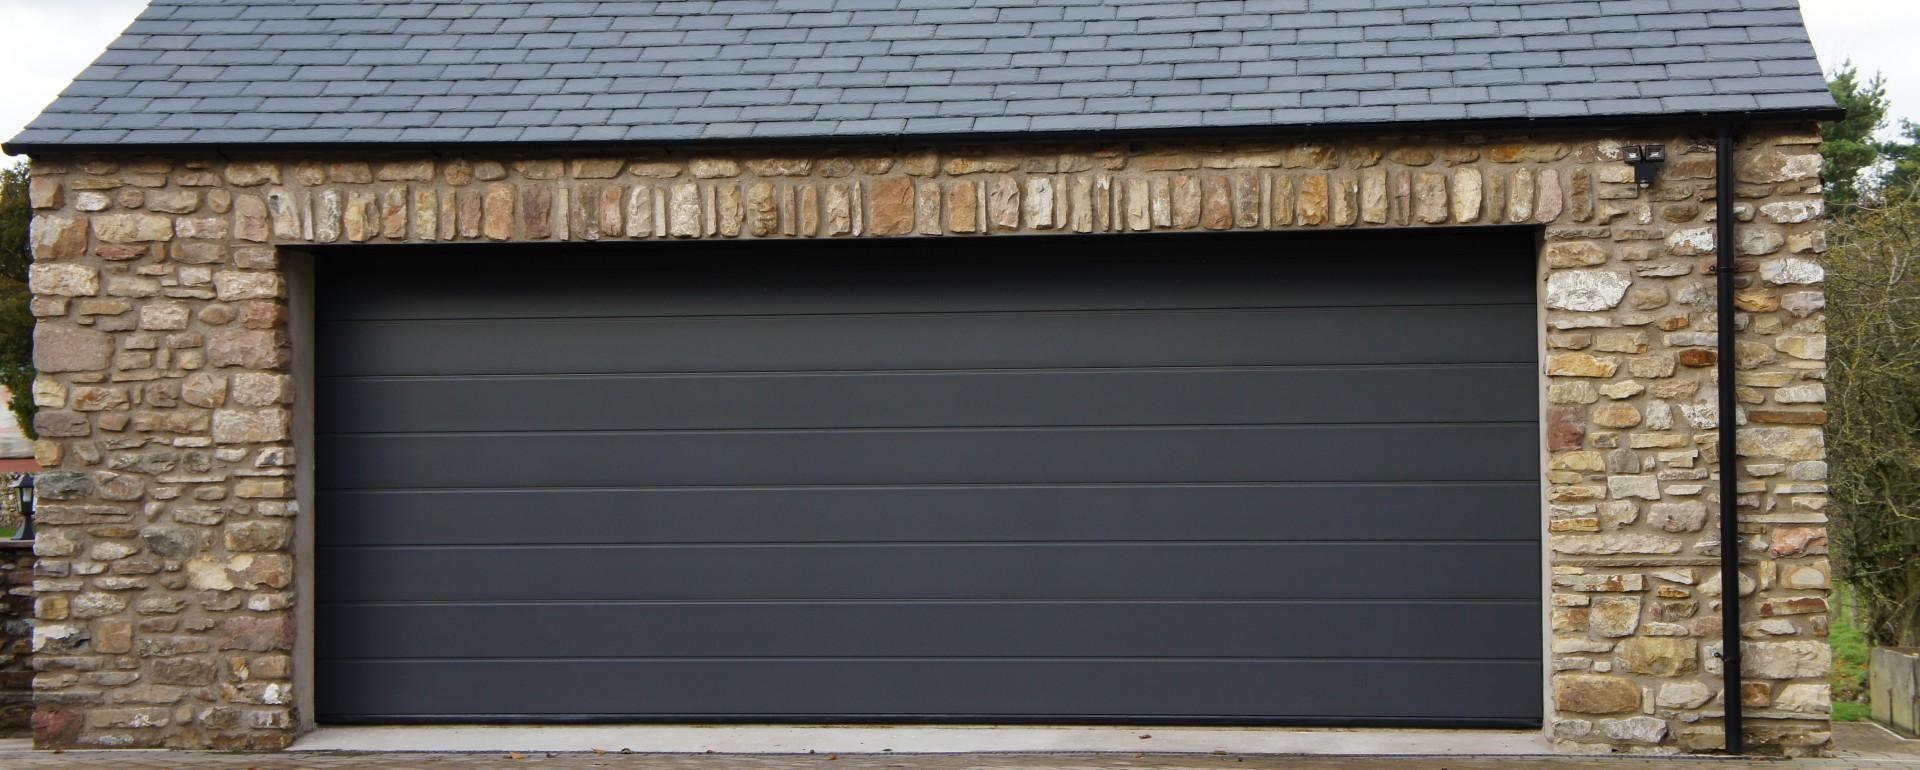 Ordinaire Lakes Garage Doors